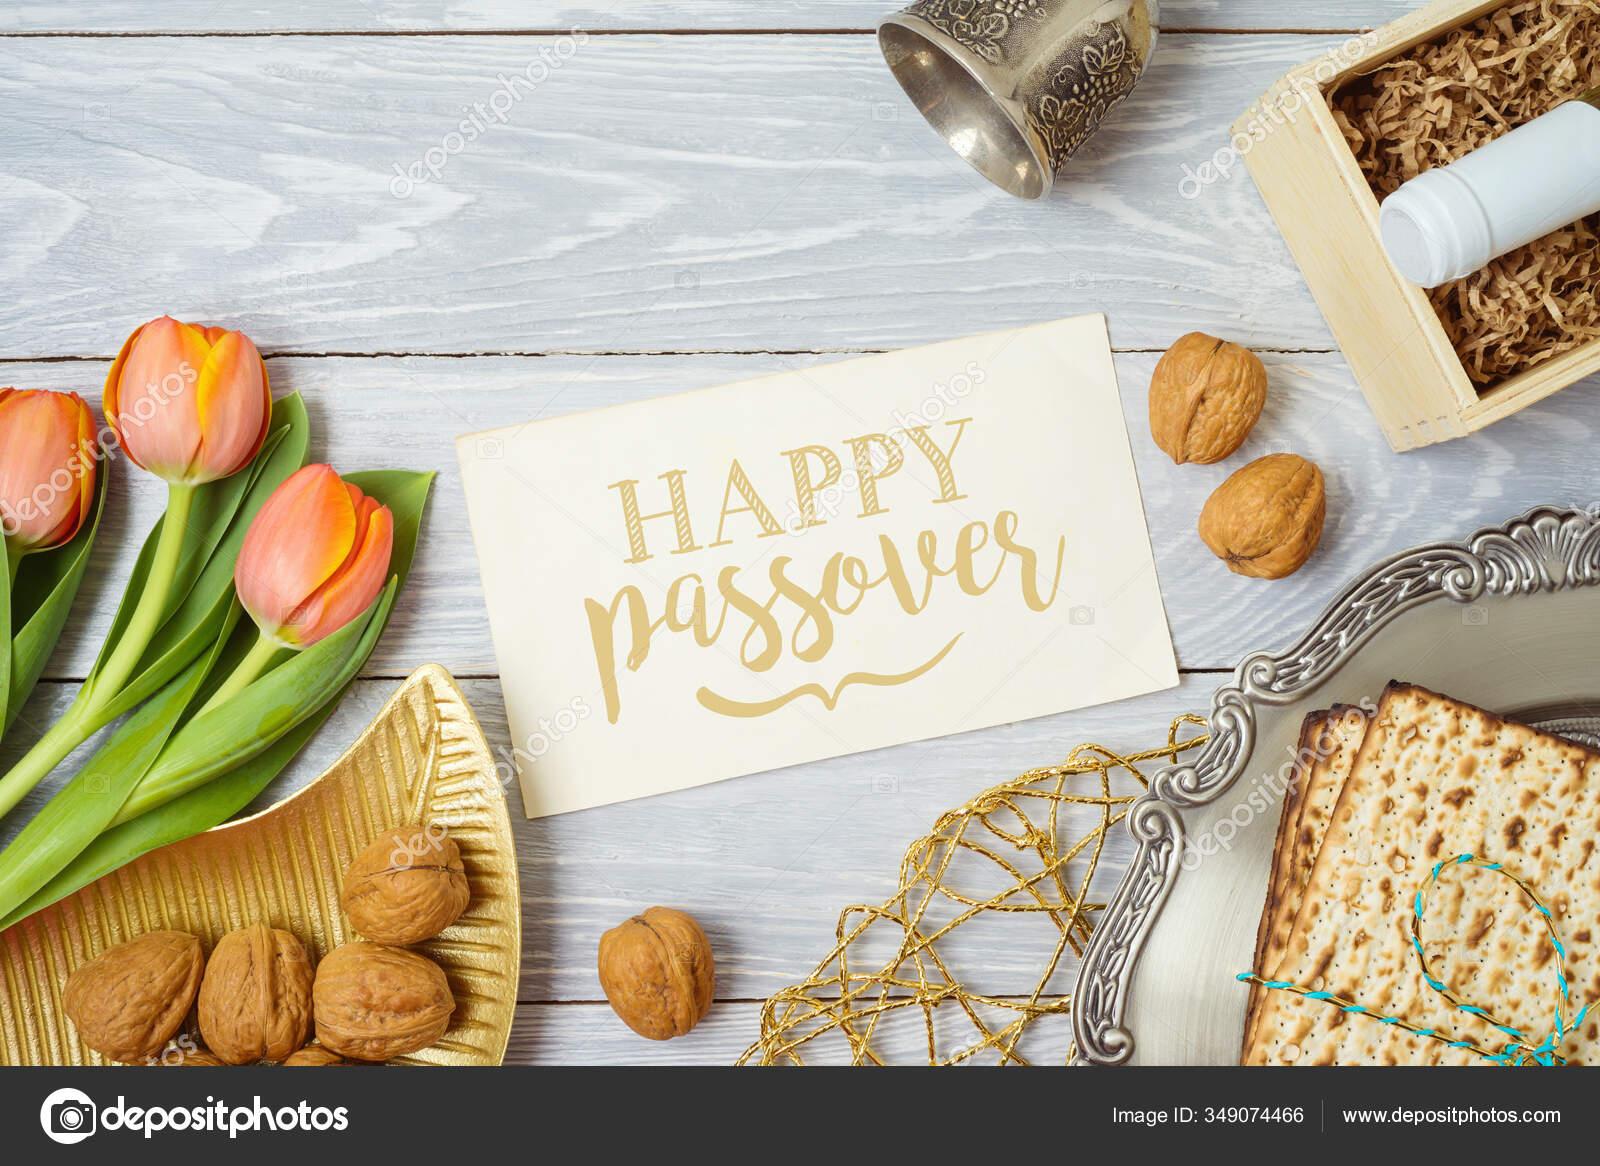 Jewish Holiday Passover Greeting Card Matzo Seder Plate Wine Tulip Stock Photo Maglara 349074466